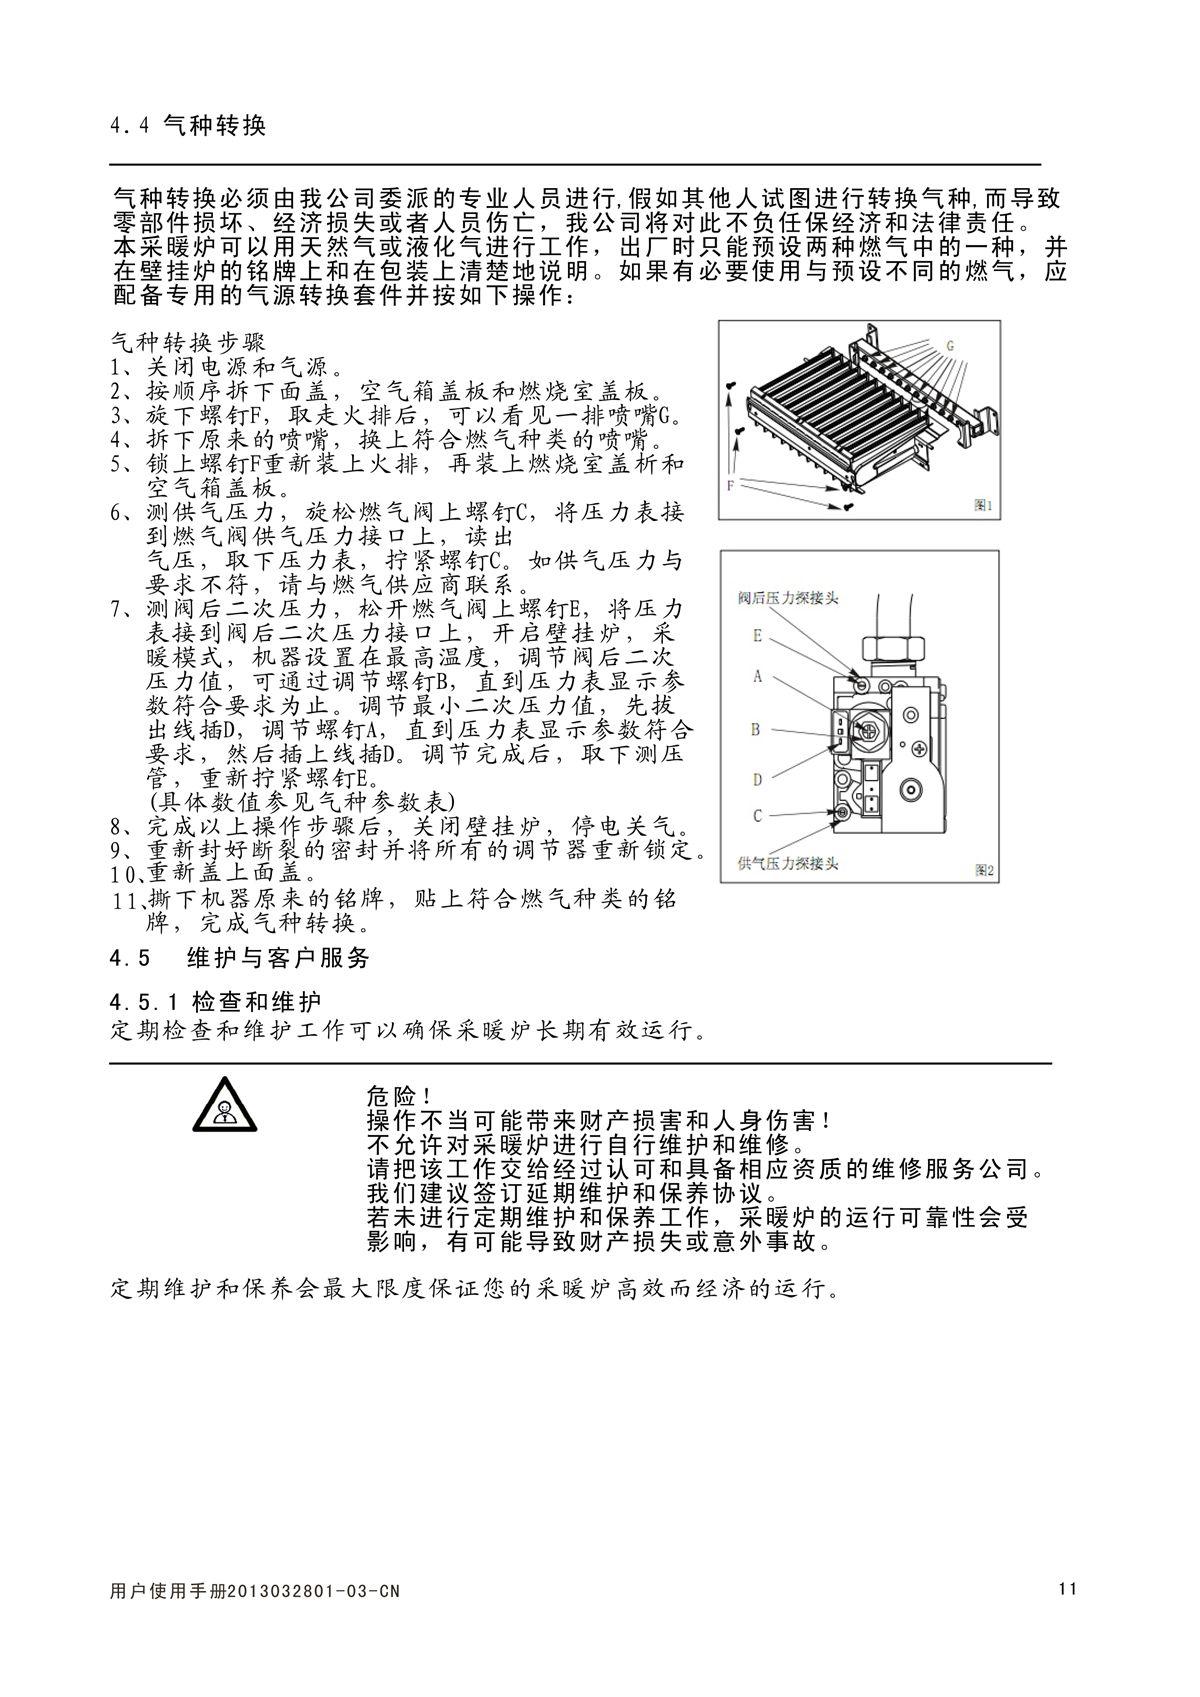 ES06系列-用户使用手册-7_02.jpg